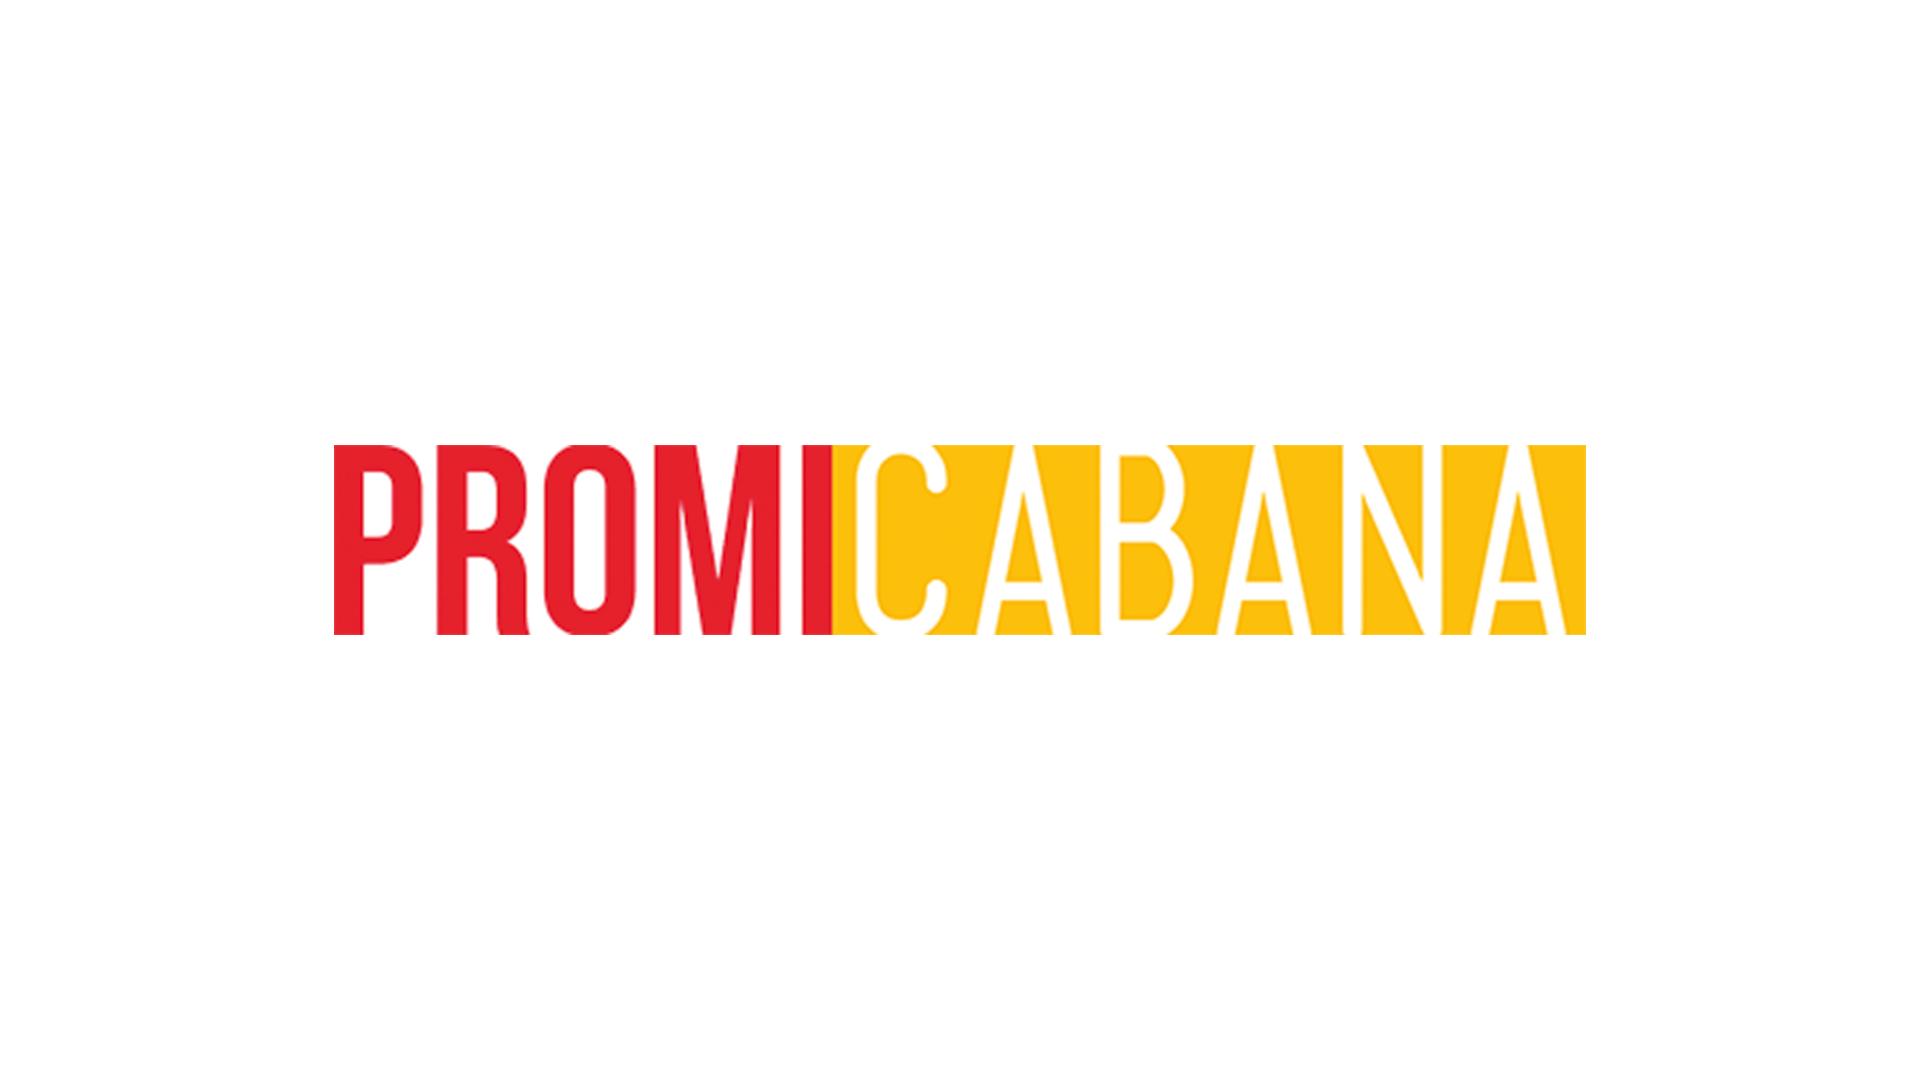 Rihanna Nude Parfüm Werbung 2